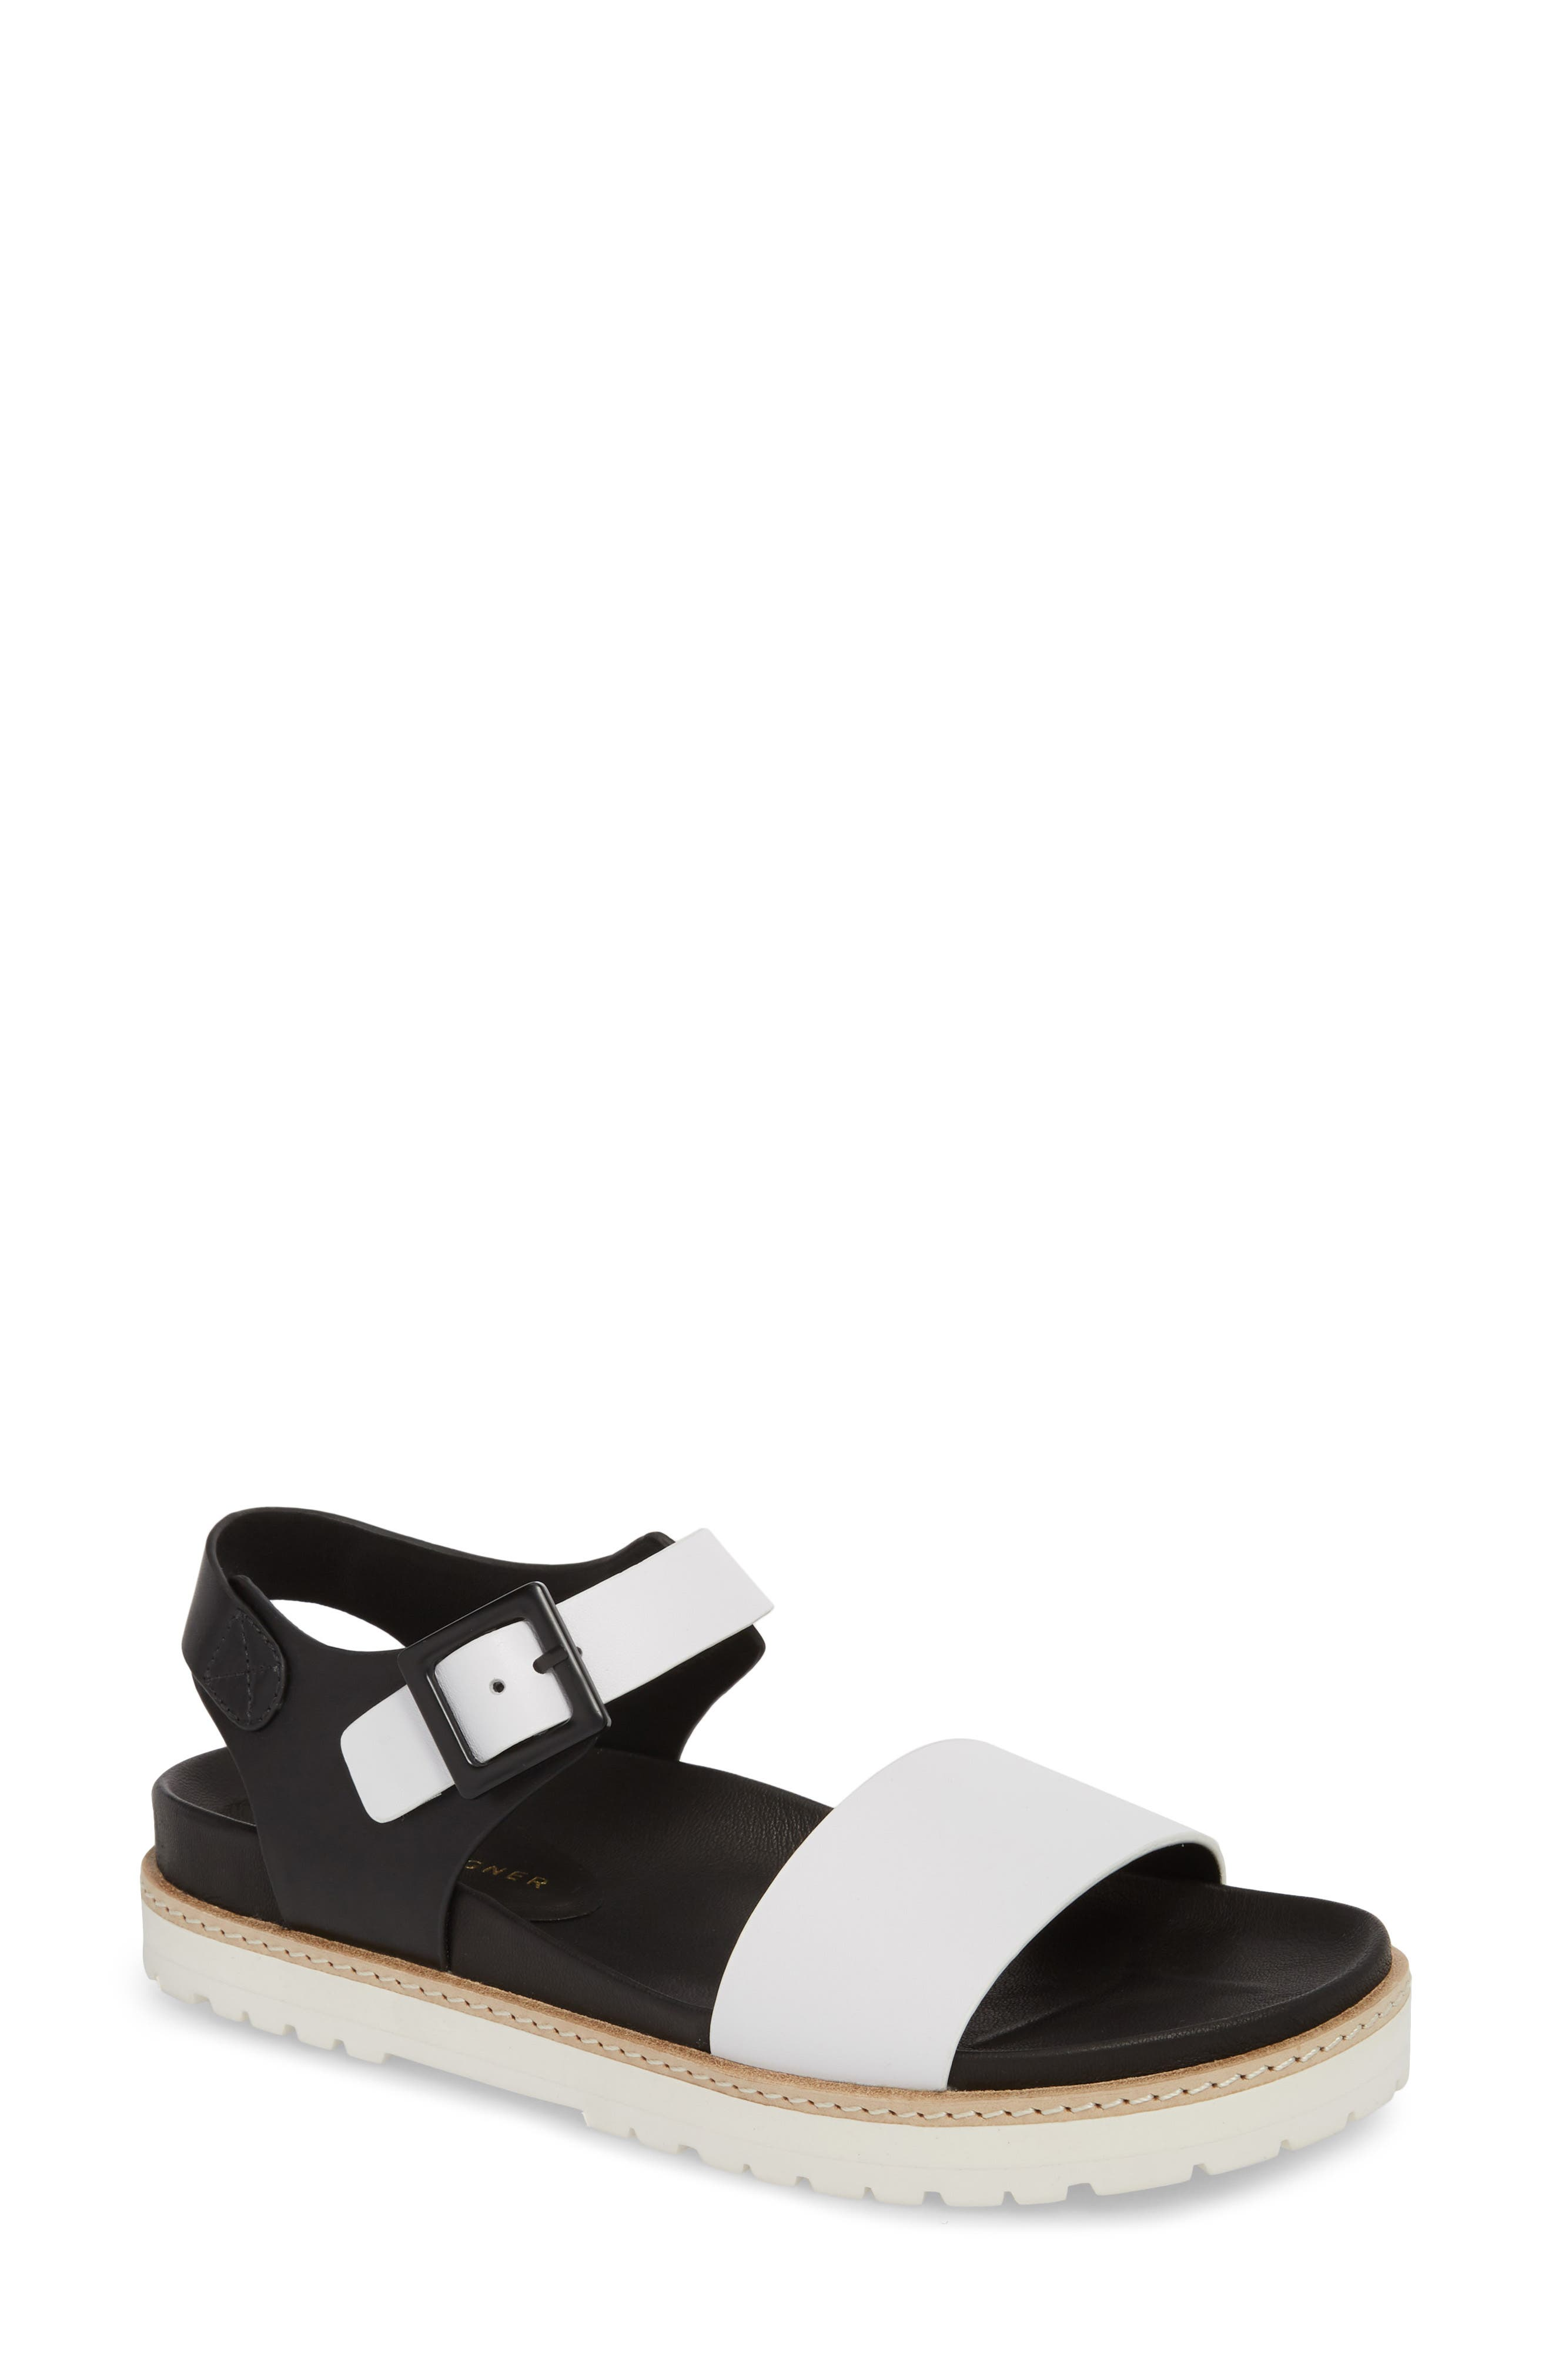 Ange Sandal,                         Main,                         color, WHITE/ BLACK LEATHER